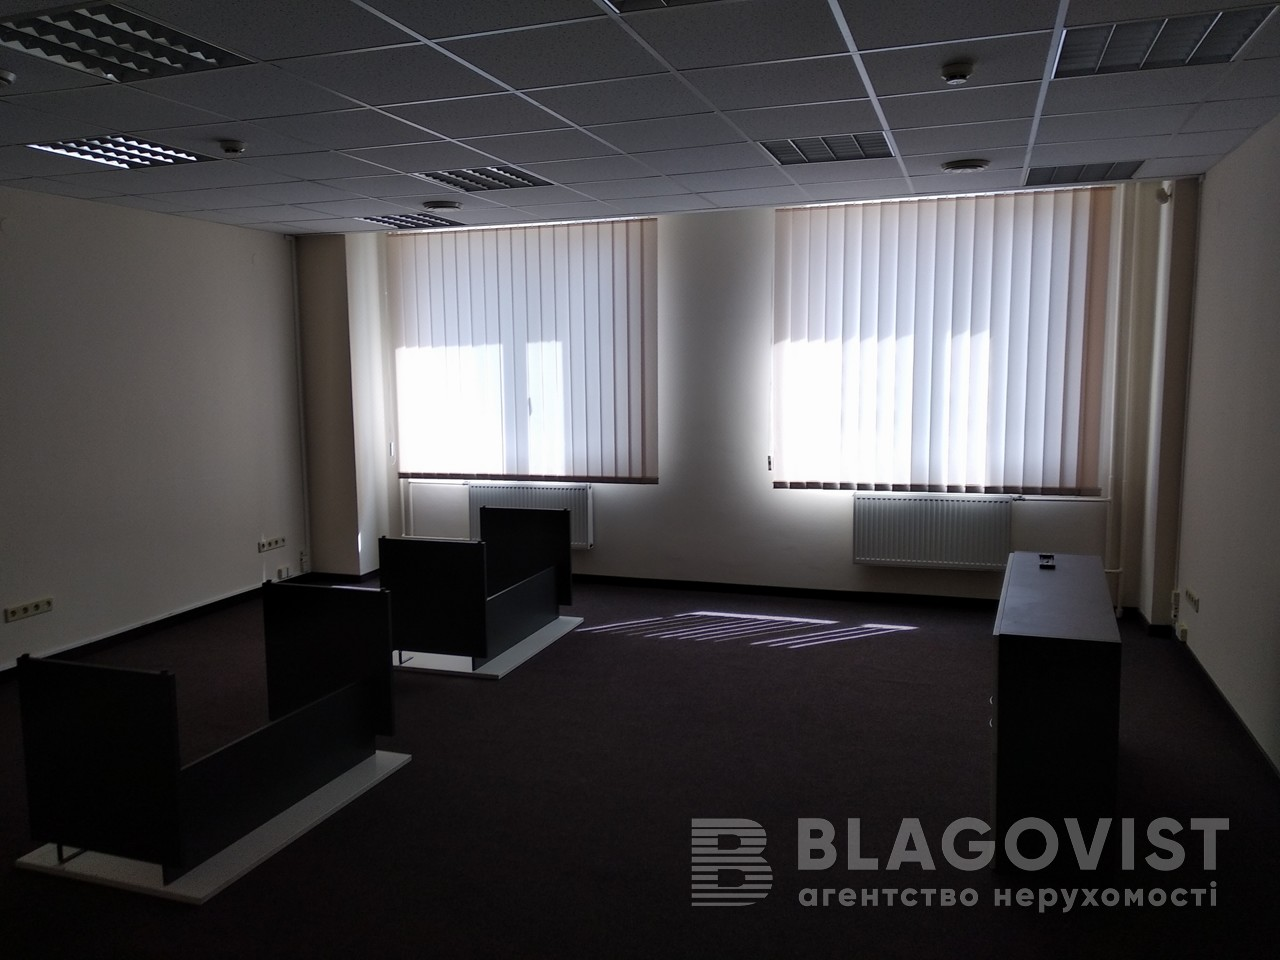 Офис, Гайдара, Киев, E-6932 - Фото 4